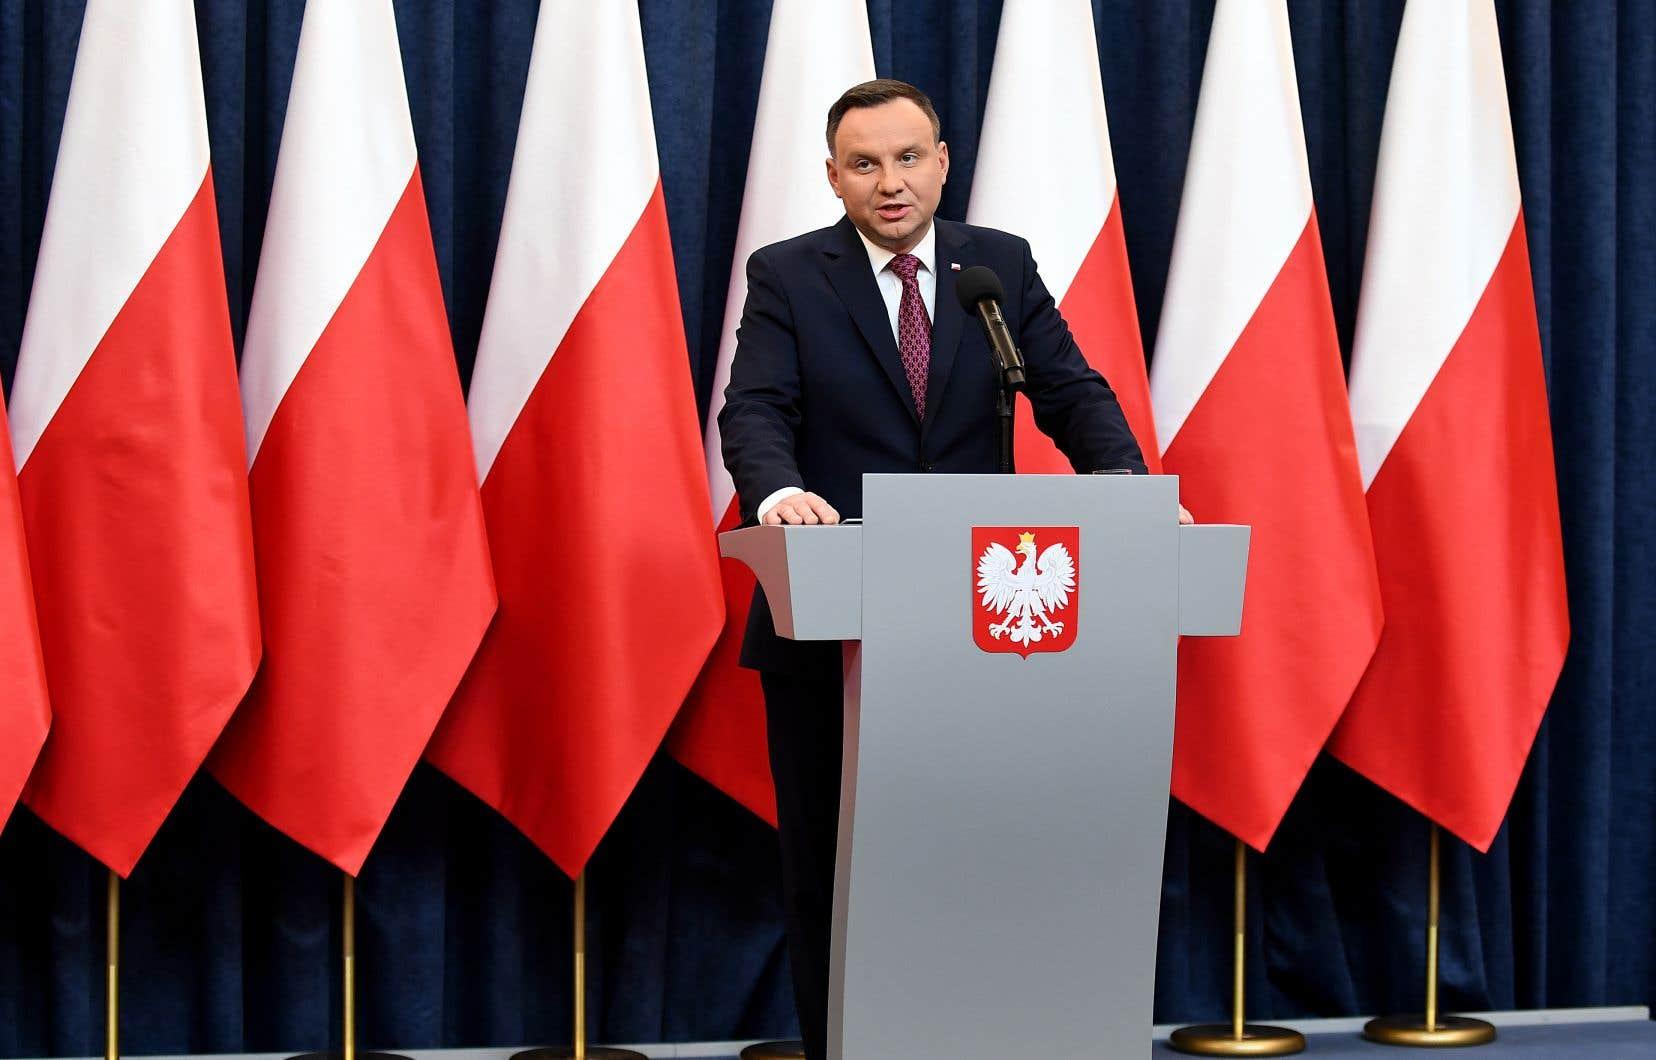 Le président polonais, Andrzej Duda